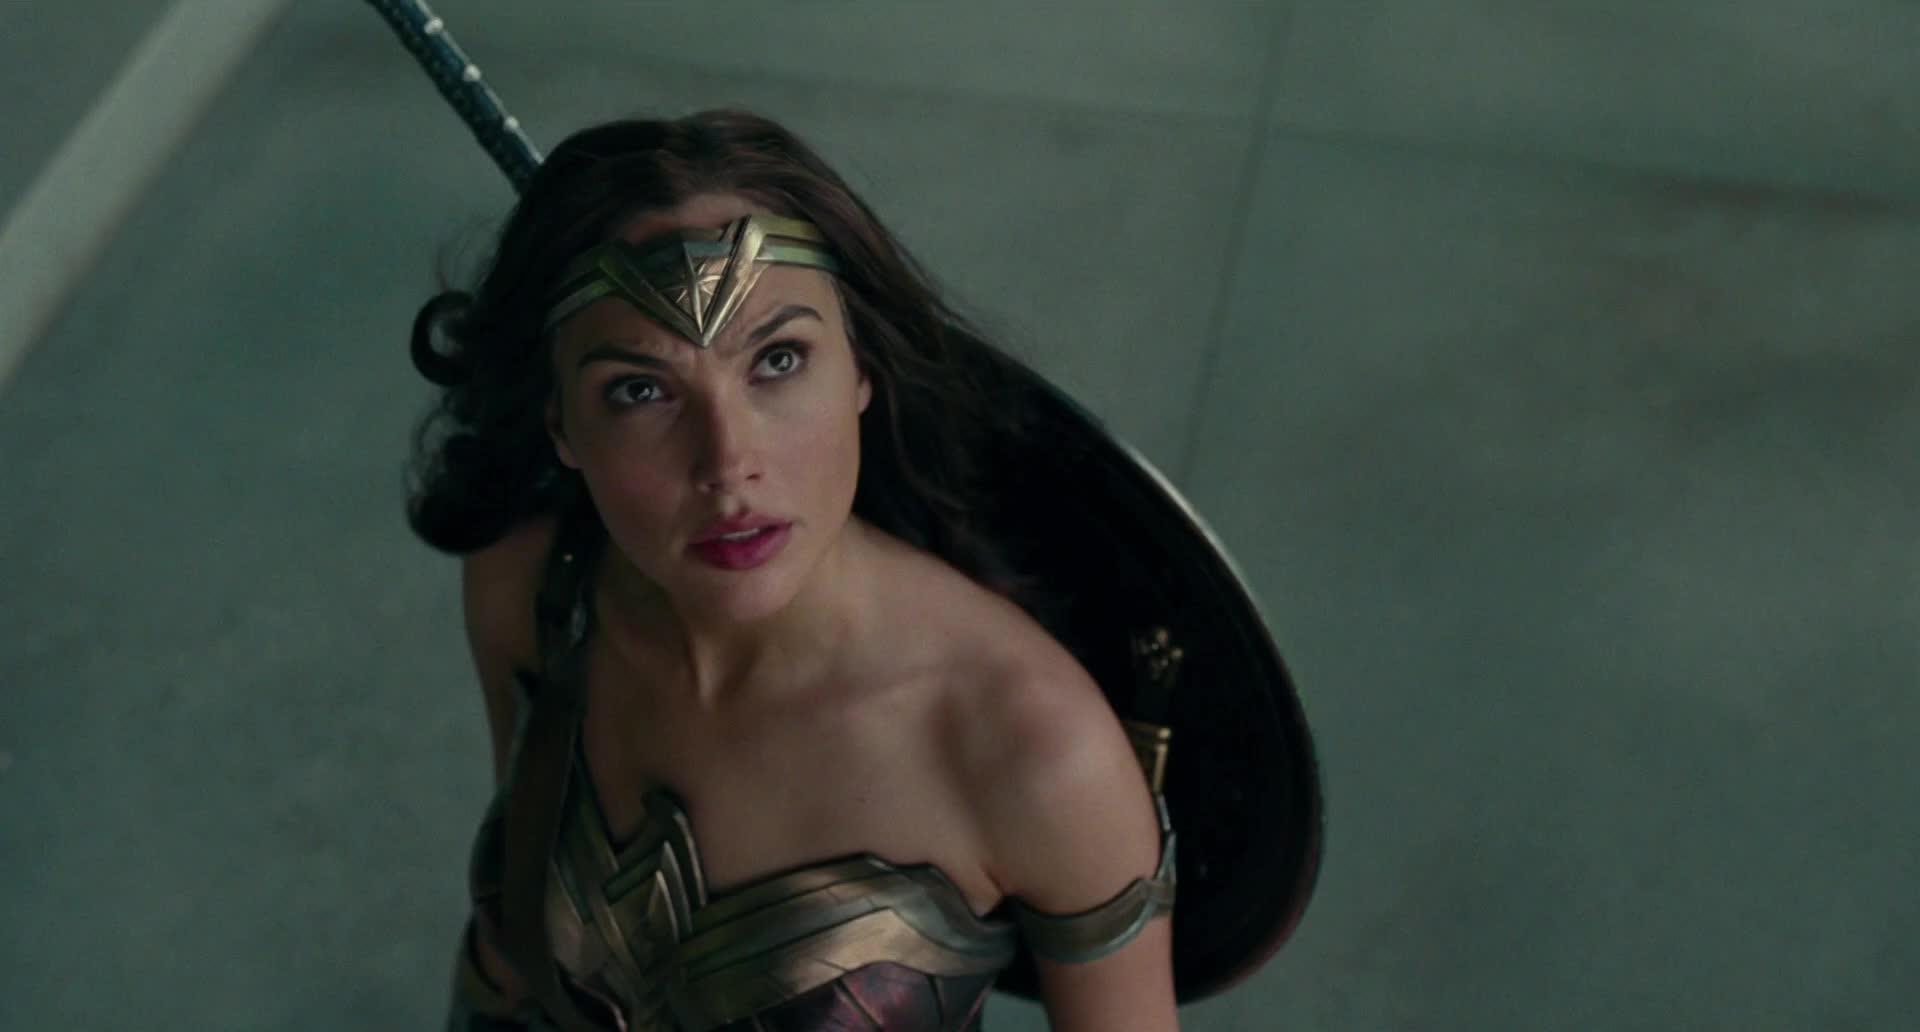 dc, heroes, justice league, justiceleague, movies, super heroes, superheroes, wonder woman, wind in her hair GIFs